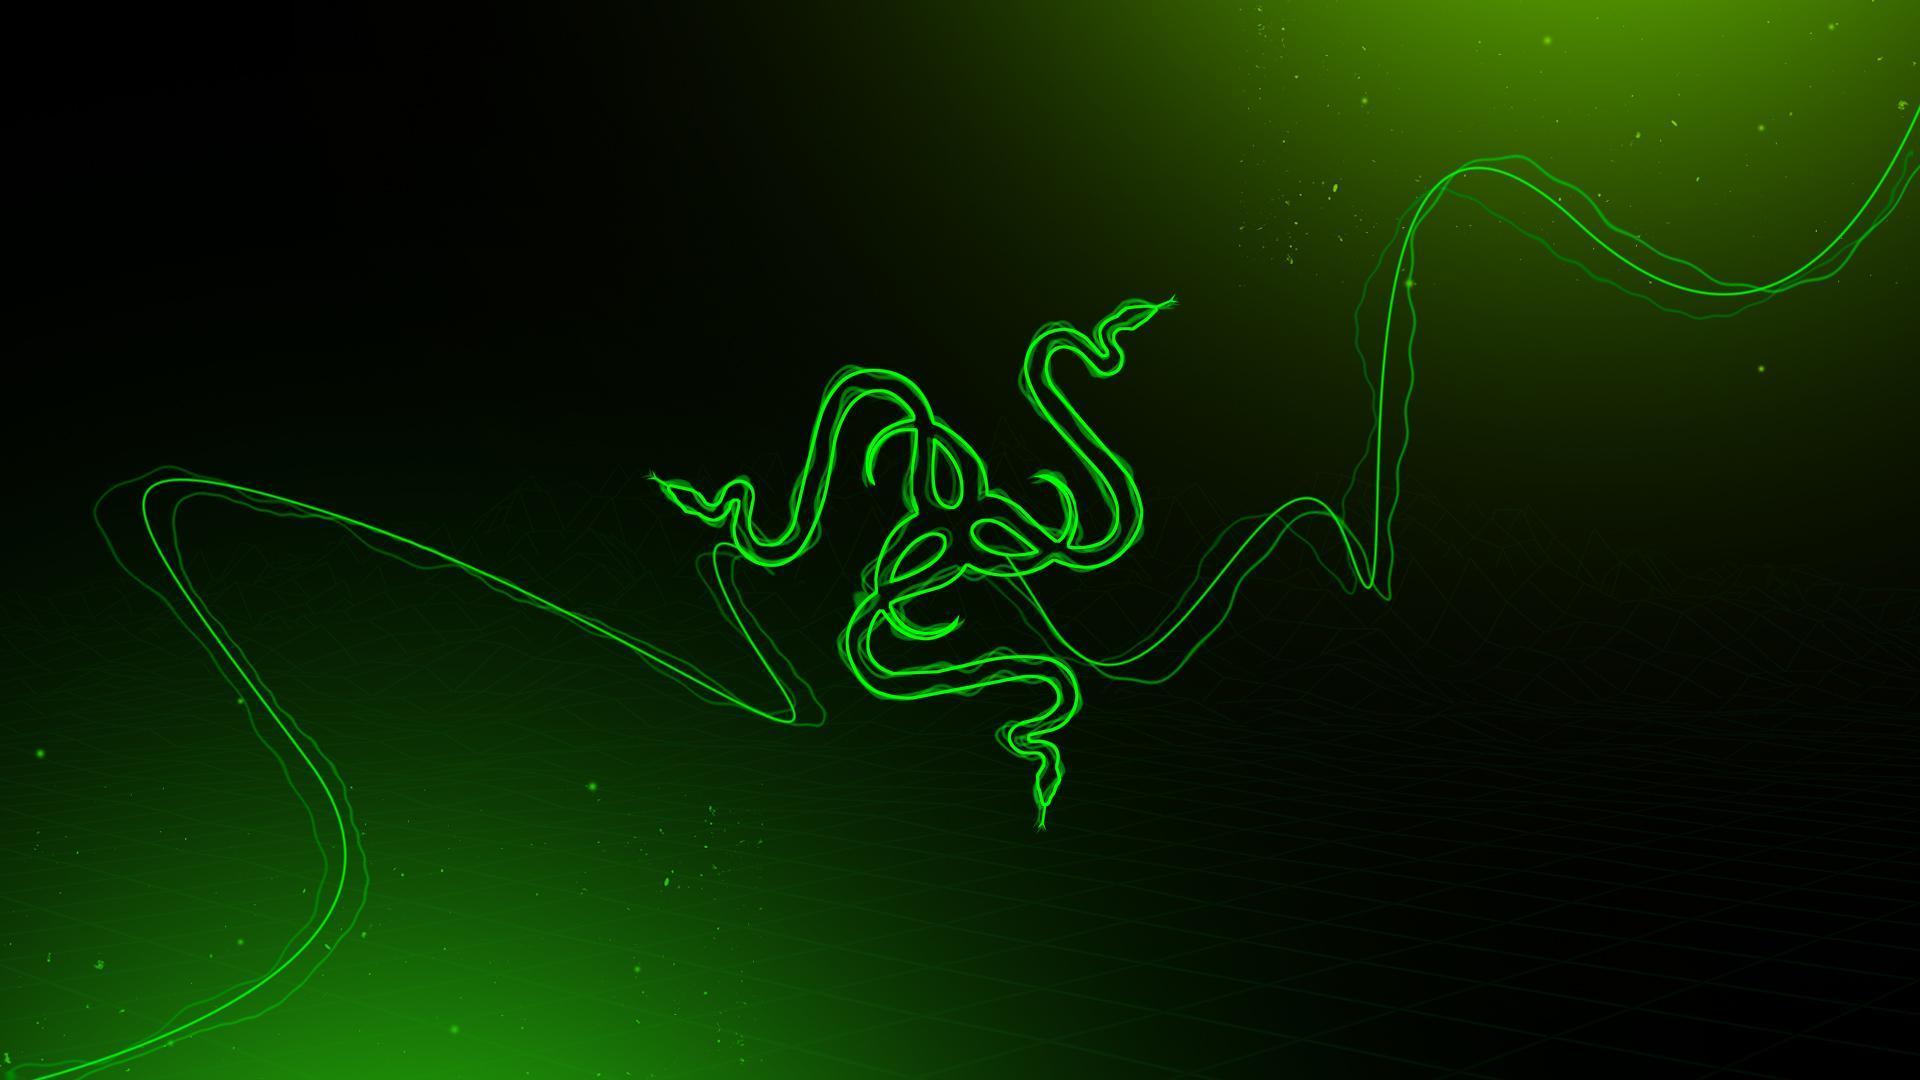 Razer Wallpapers Top Free Razer Backgrounds Wallpaperaccess